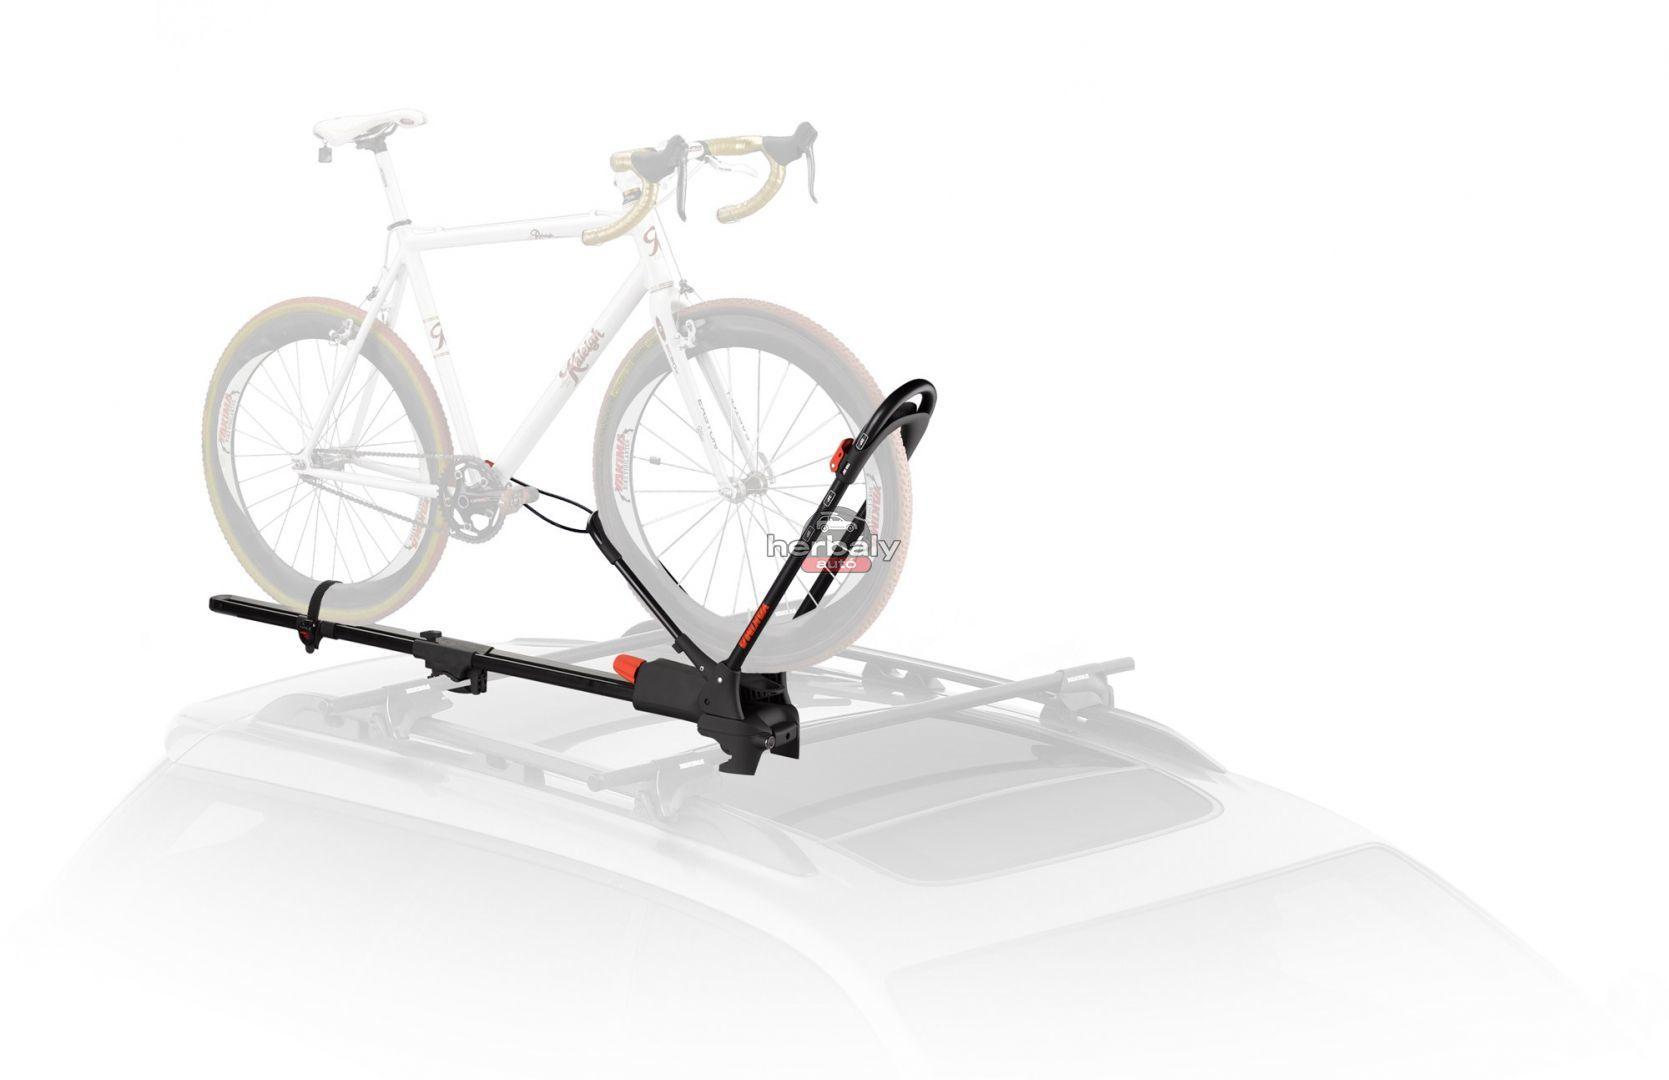 Yakima FrontLoader kerékpártartó